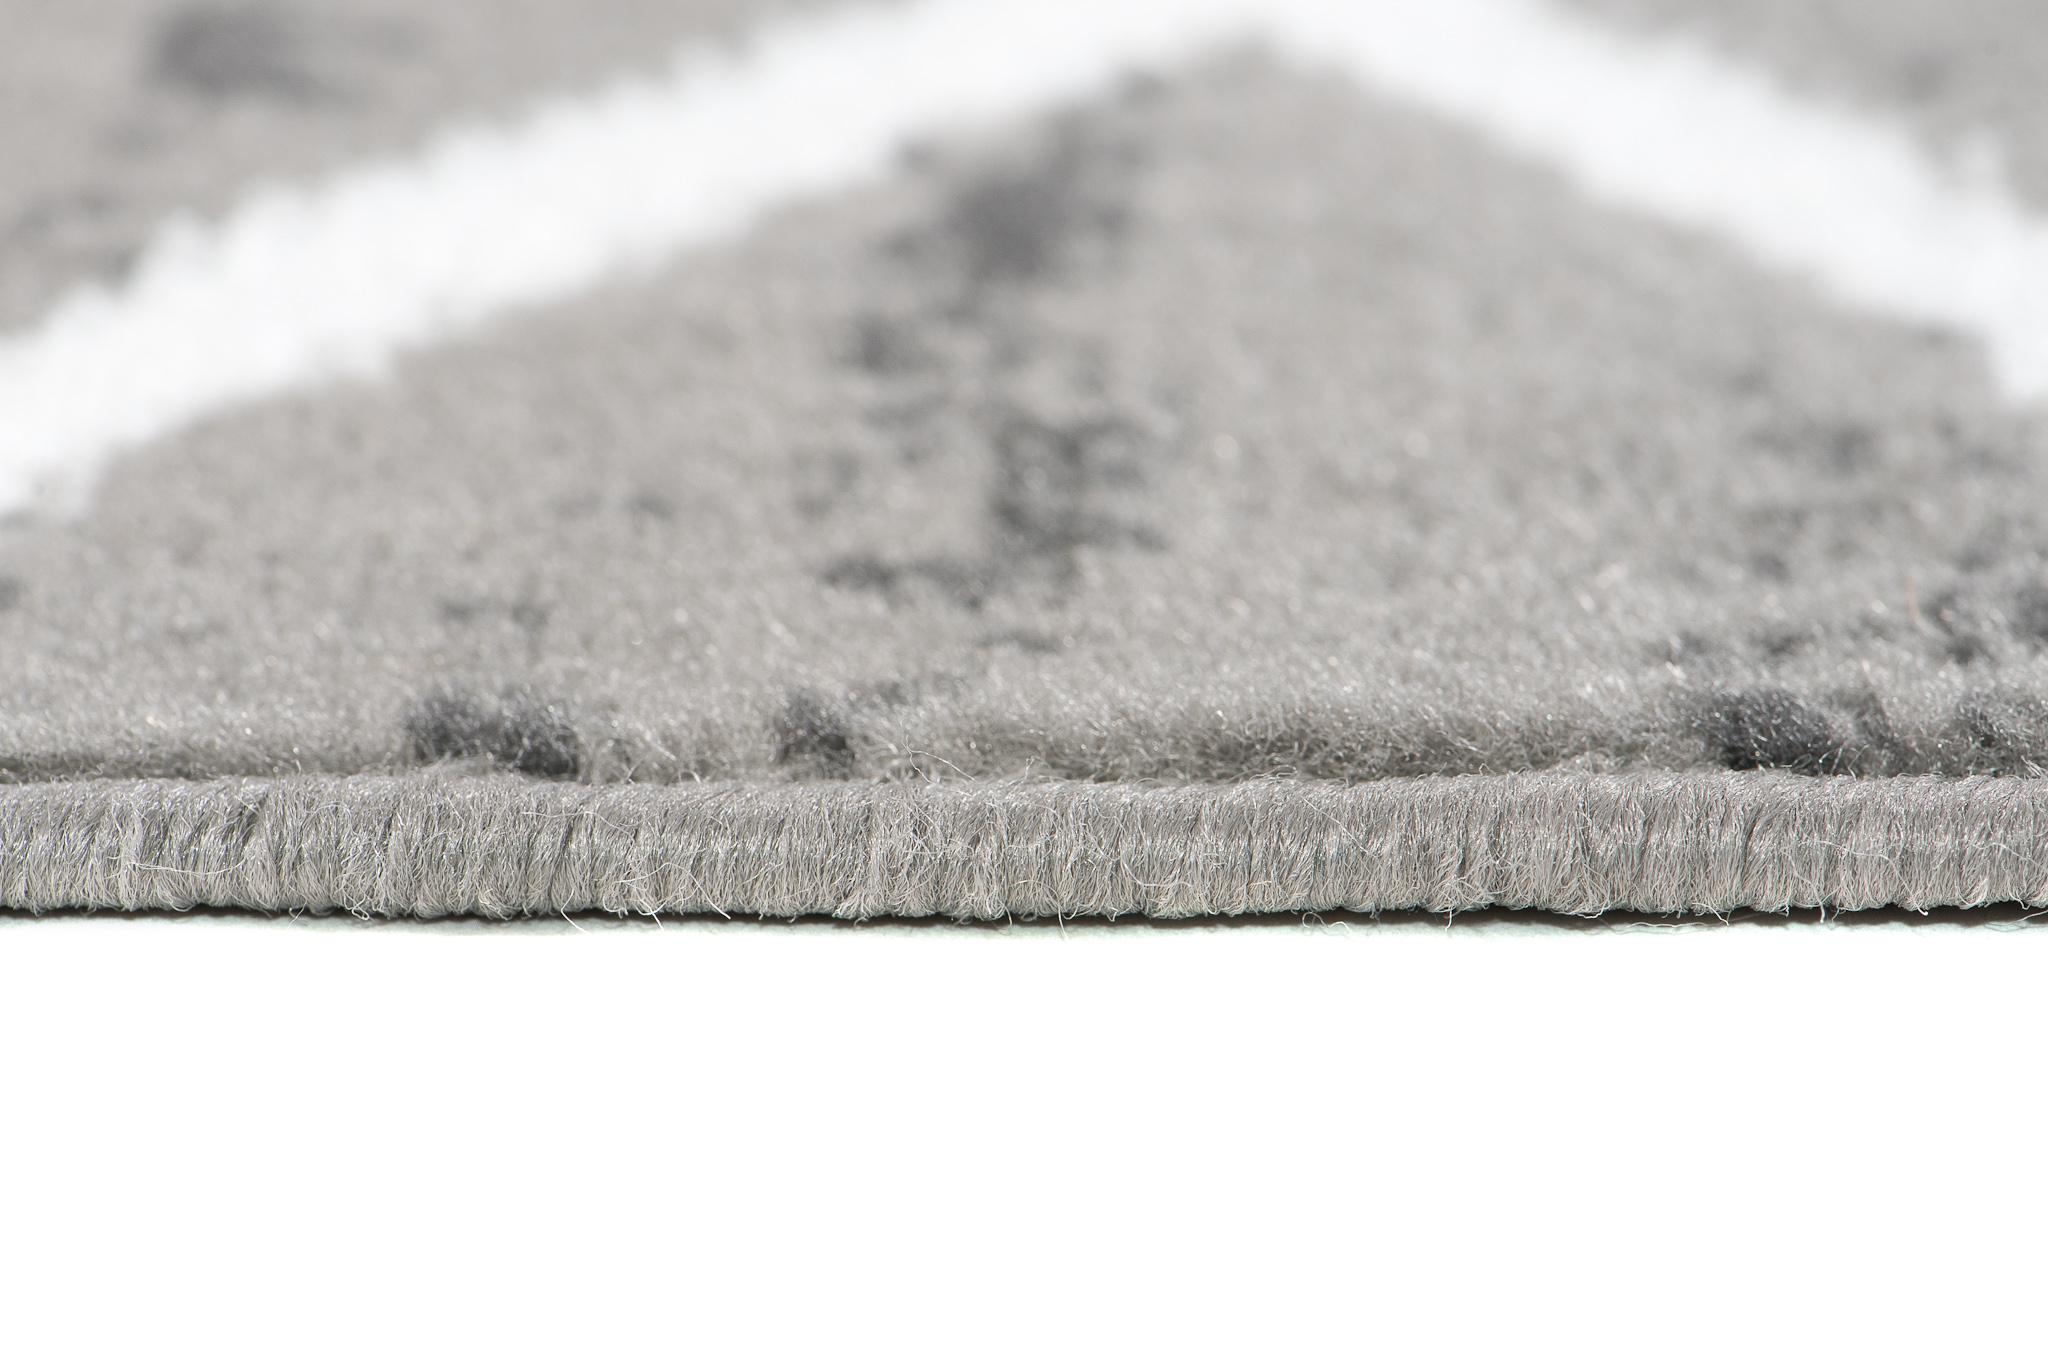 Zone Gris Tapis moderne salon style Plancher Tapis Petit Large Taille Basse Pile